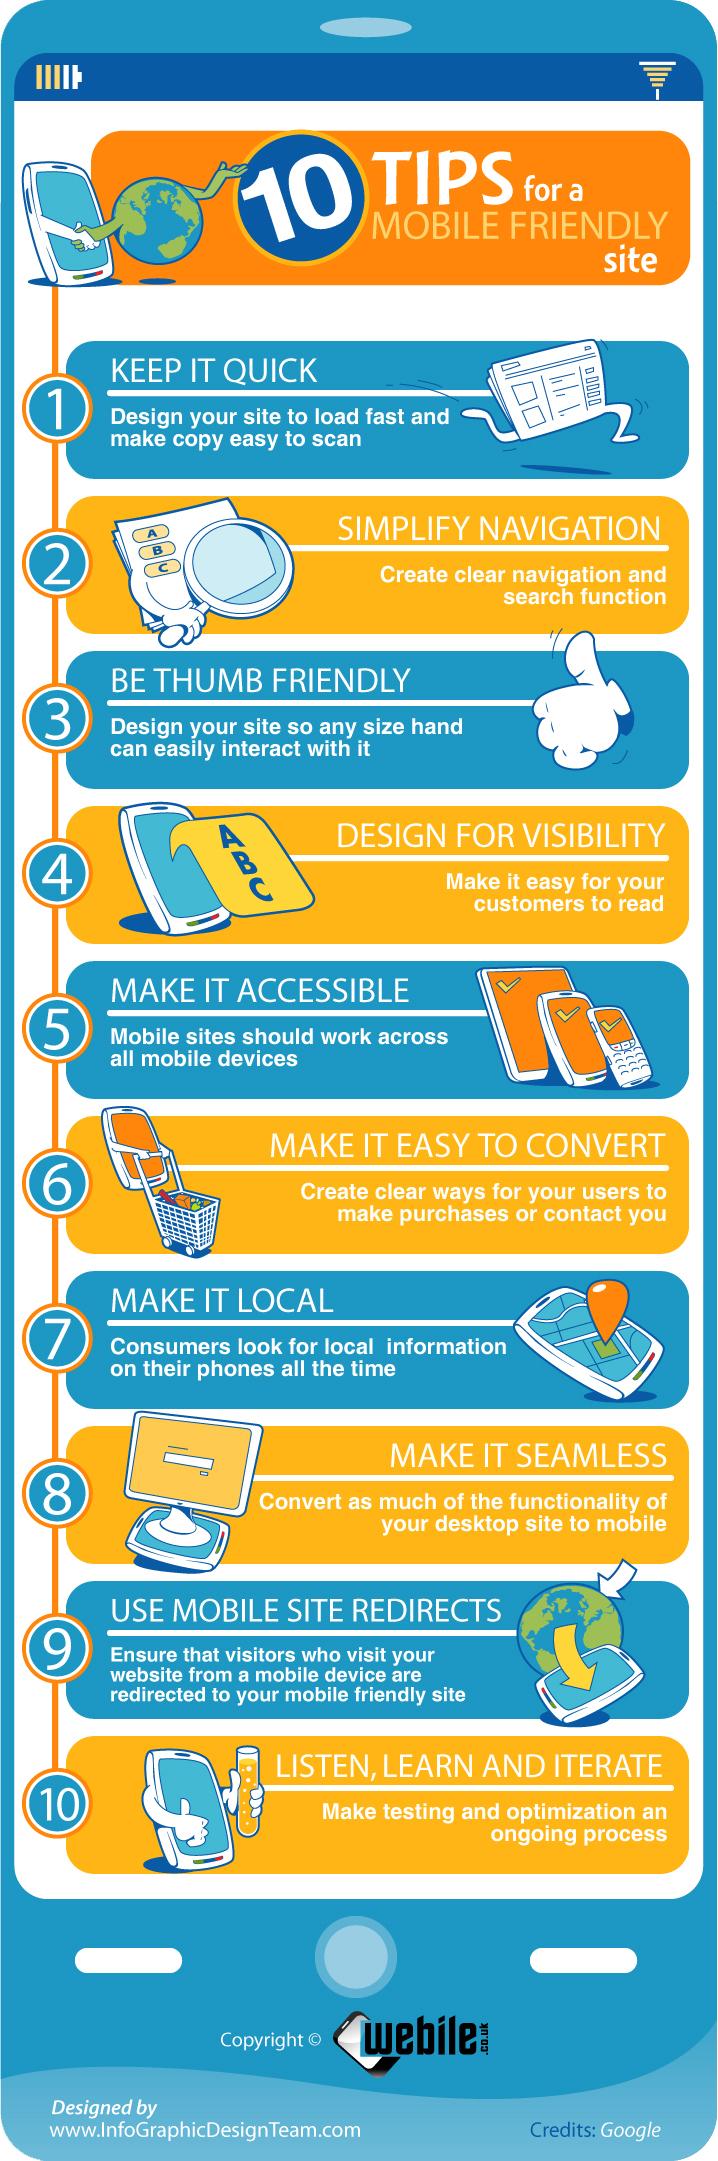 10 Mobile-Friendly Web Design Tips For Success